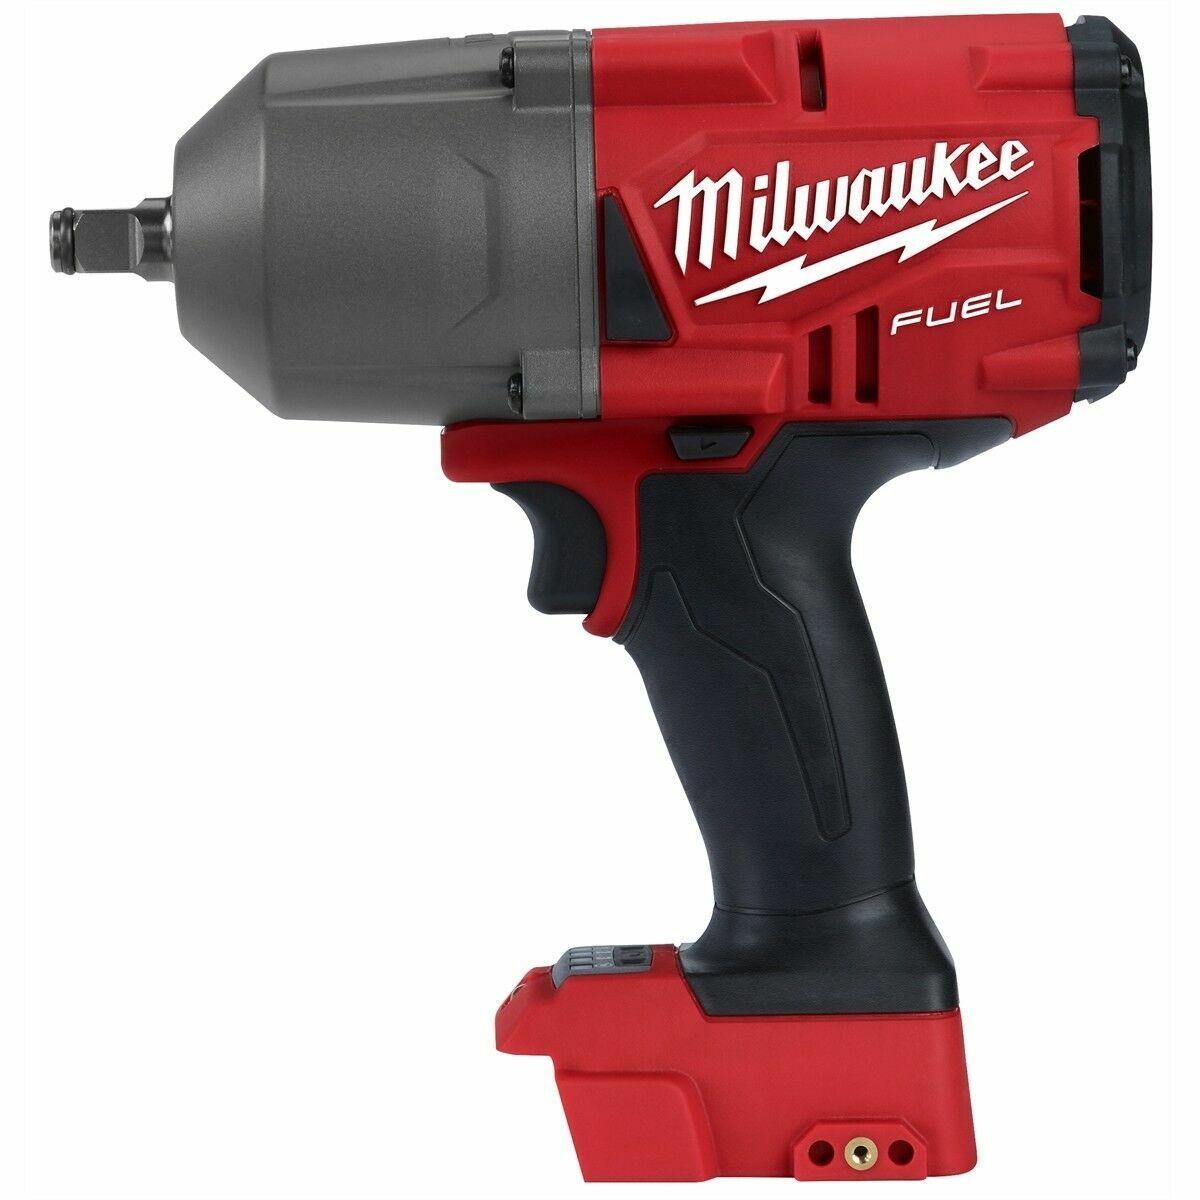 "Milwaukee 2767-20 M18 FUEL 1/2"" Drive Impact Wrench Gun W/FRICTION RING GEN 2"